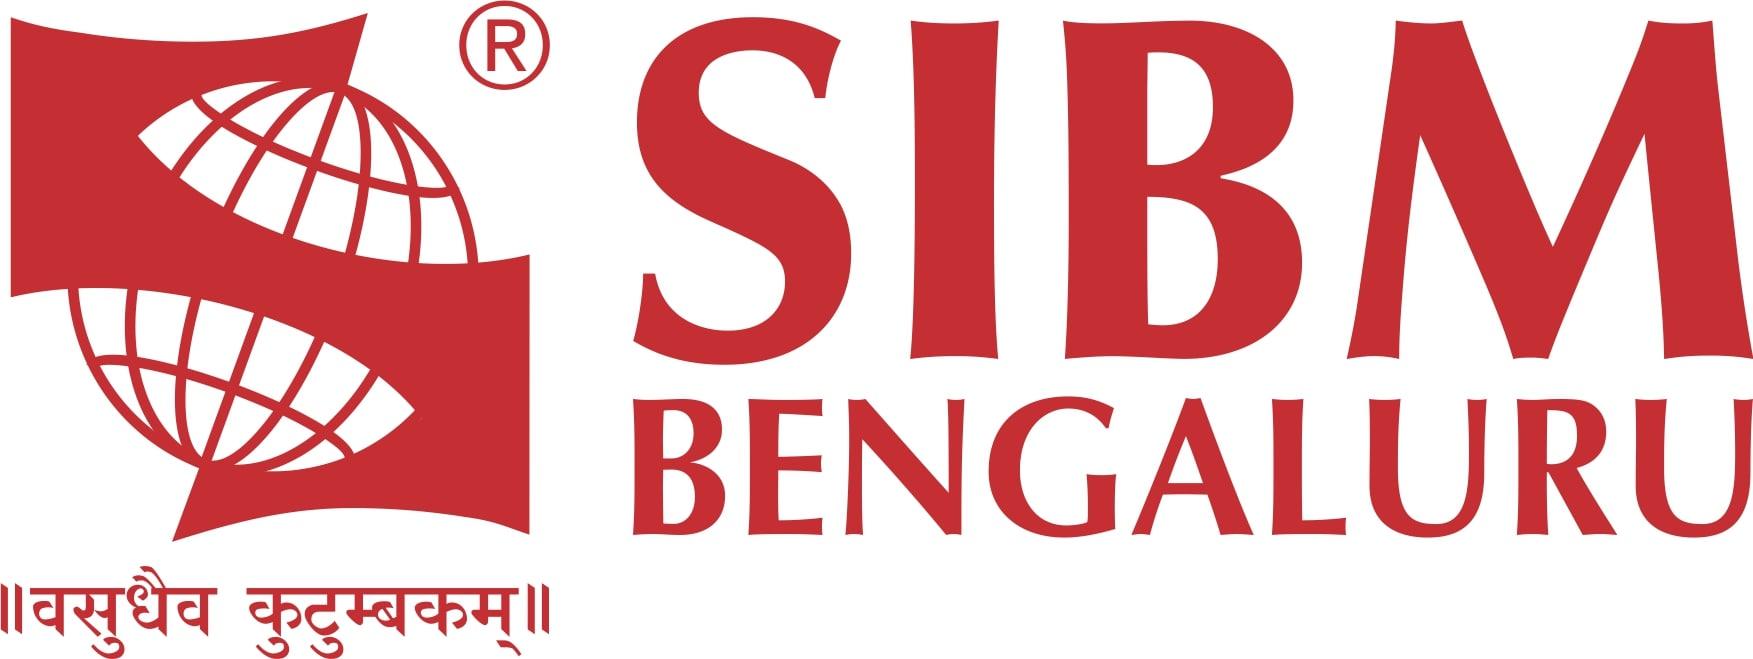 MBA Colleges in Bangalore[ SIBM B]